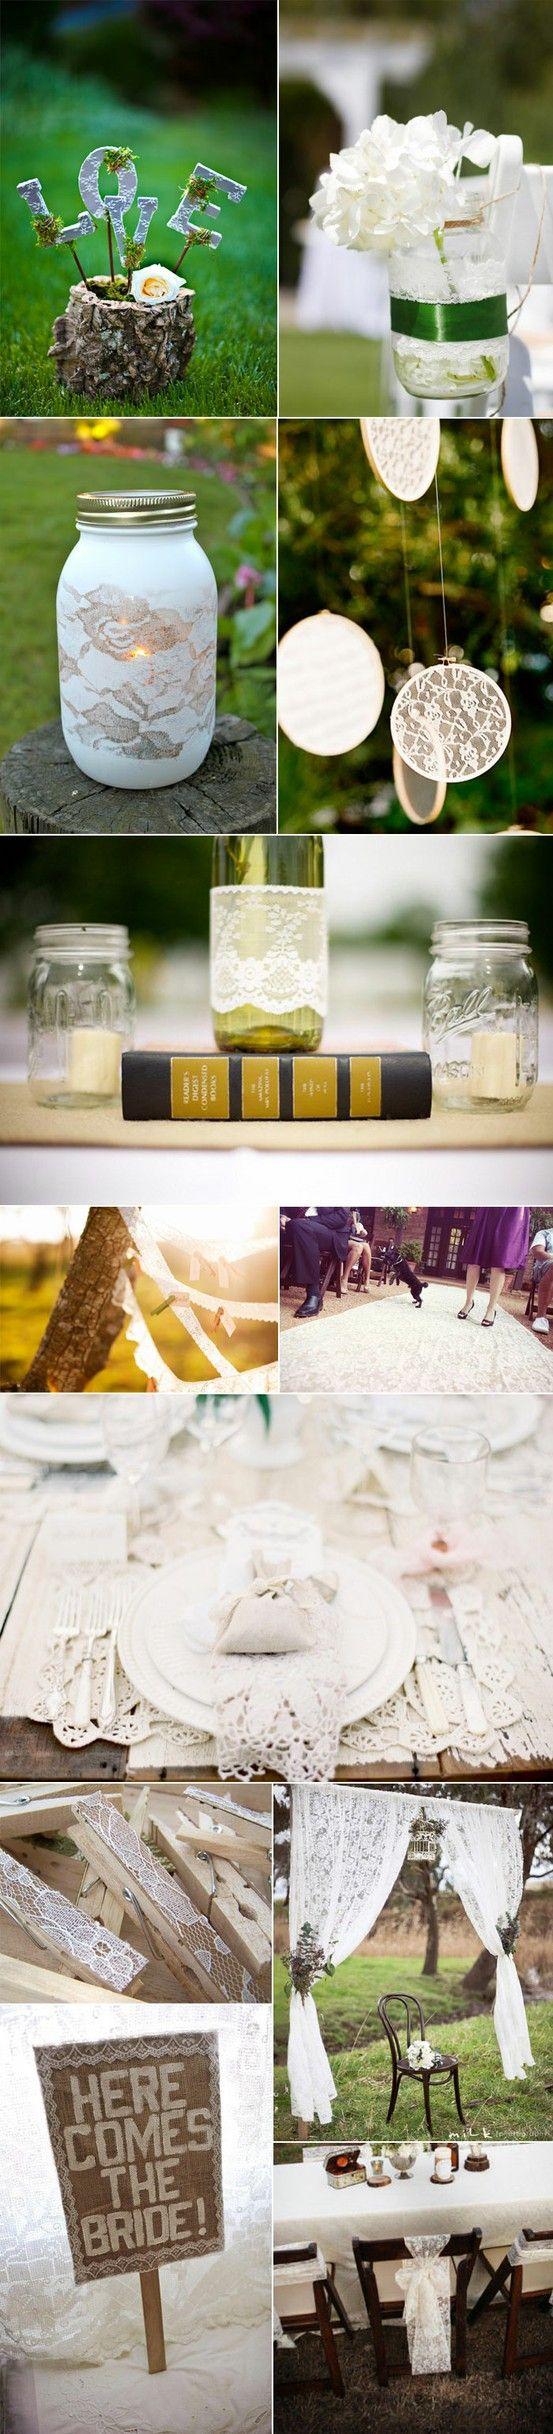 DIY lace wedding decorations.